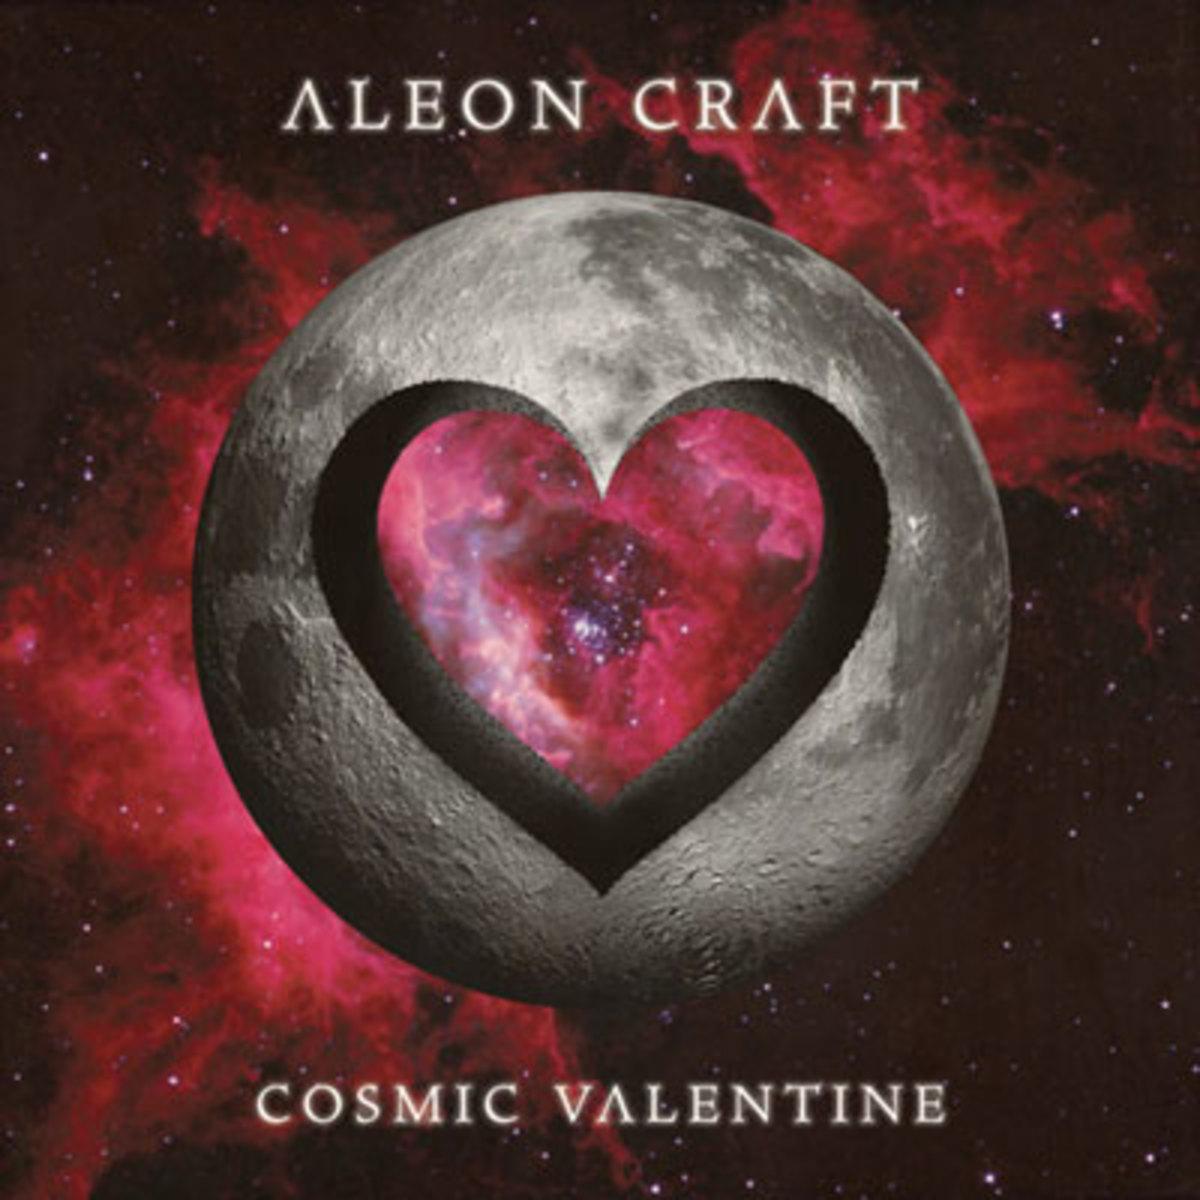 aleoncraft-cosmicvalentine.jpg